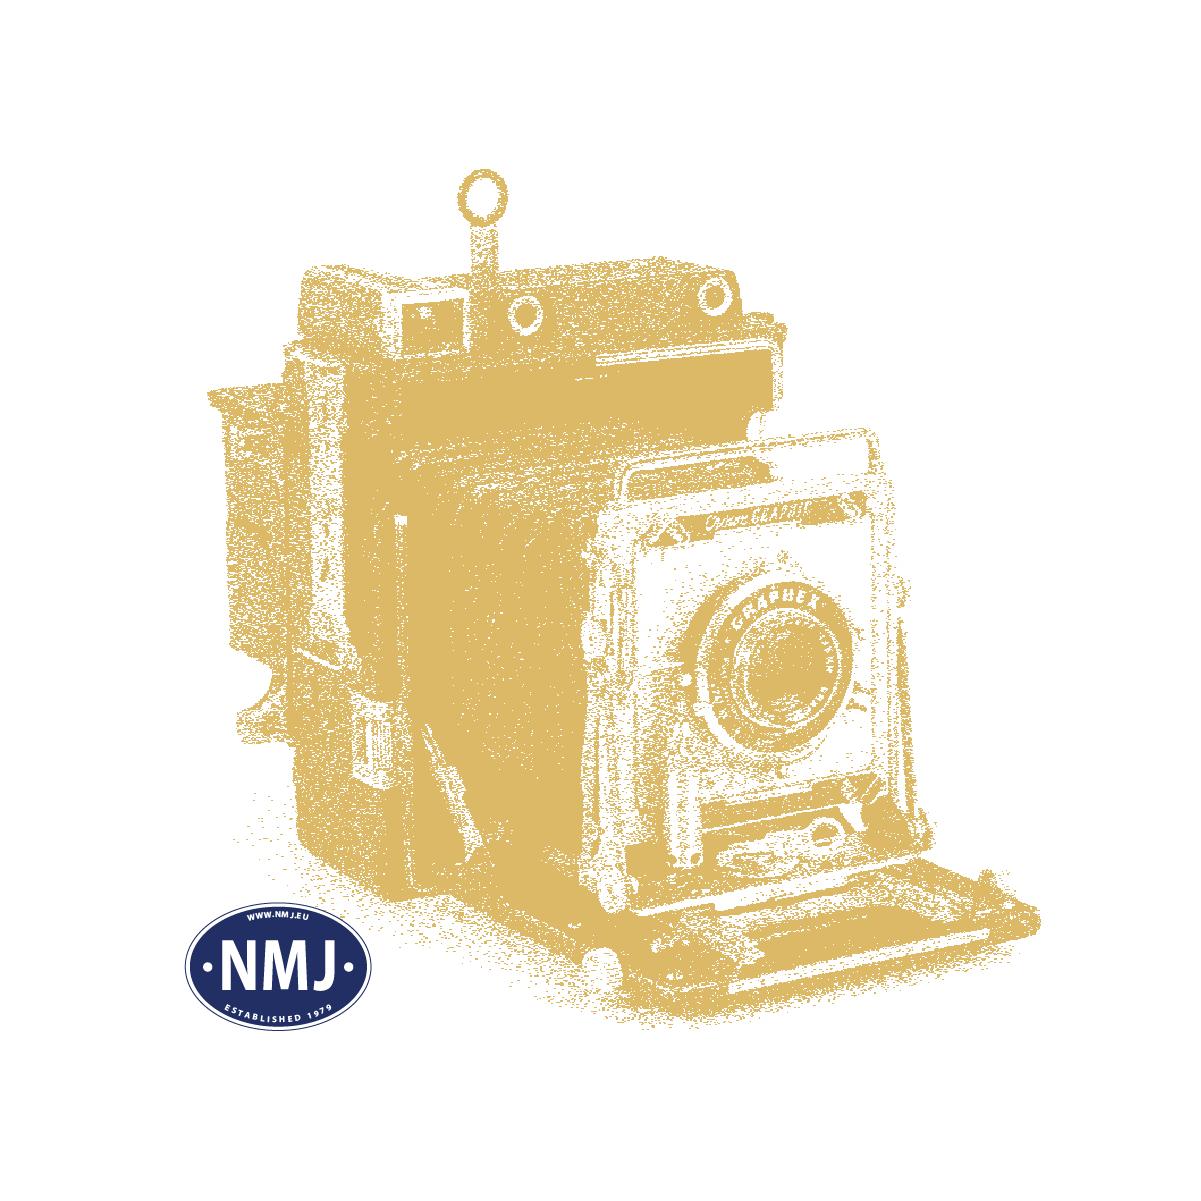 NMJT90011 - NMJ Topline NSB Di3a.617, altes Design, DC